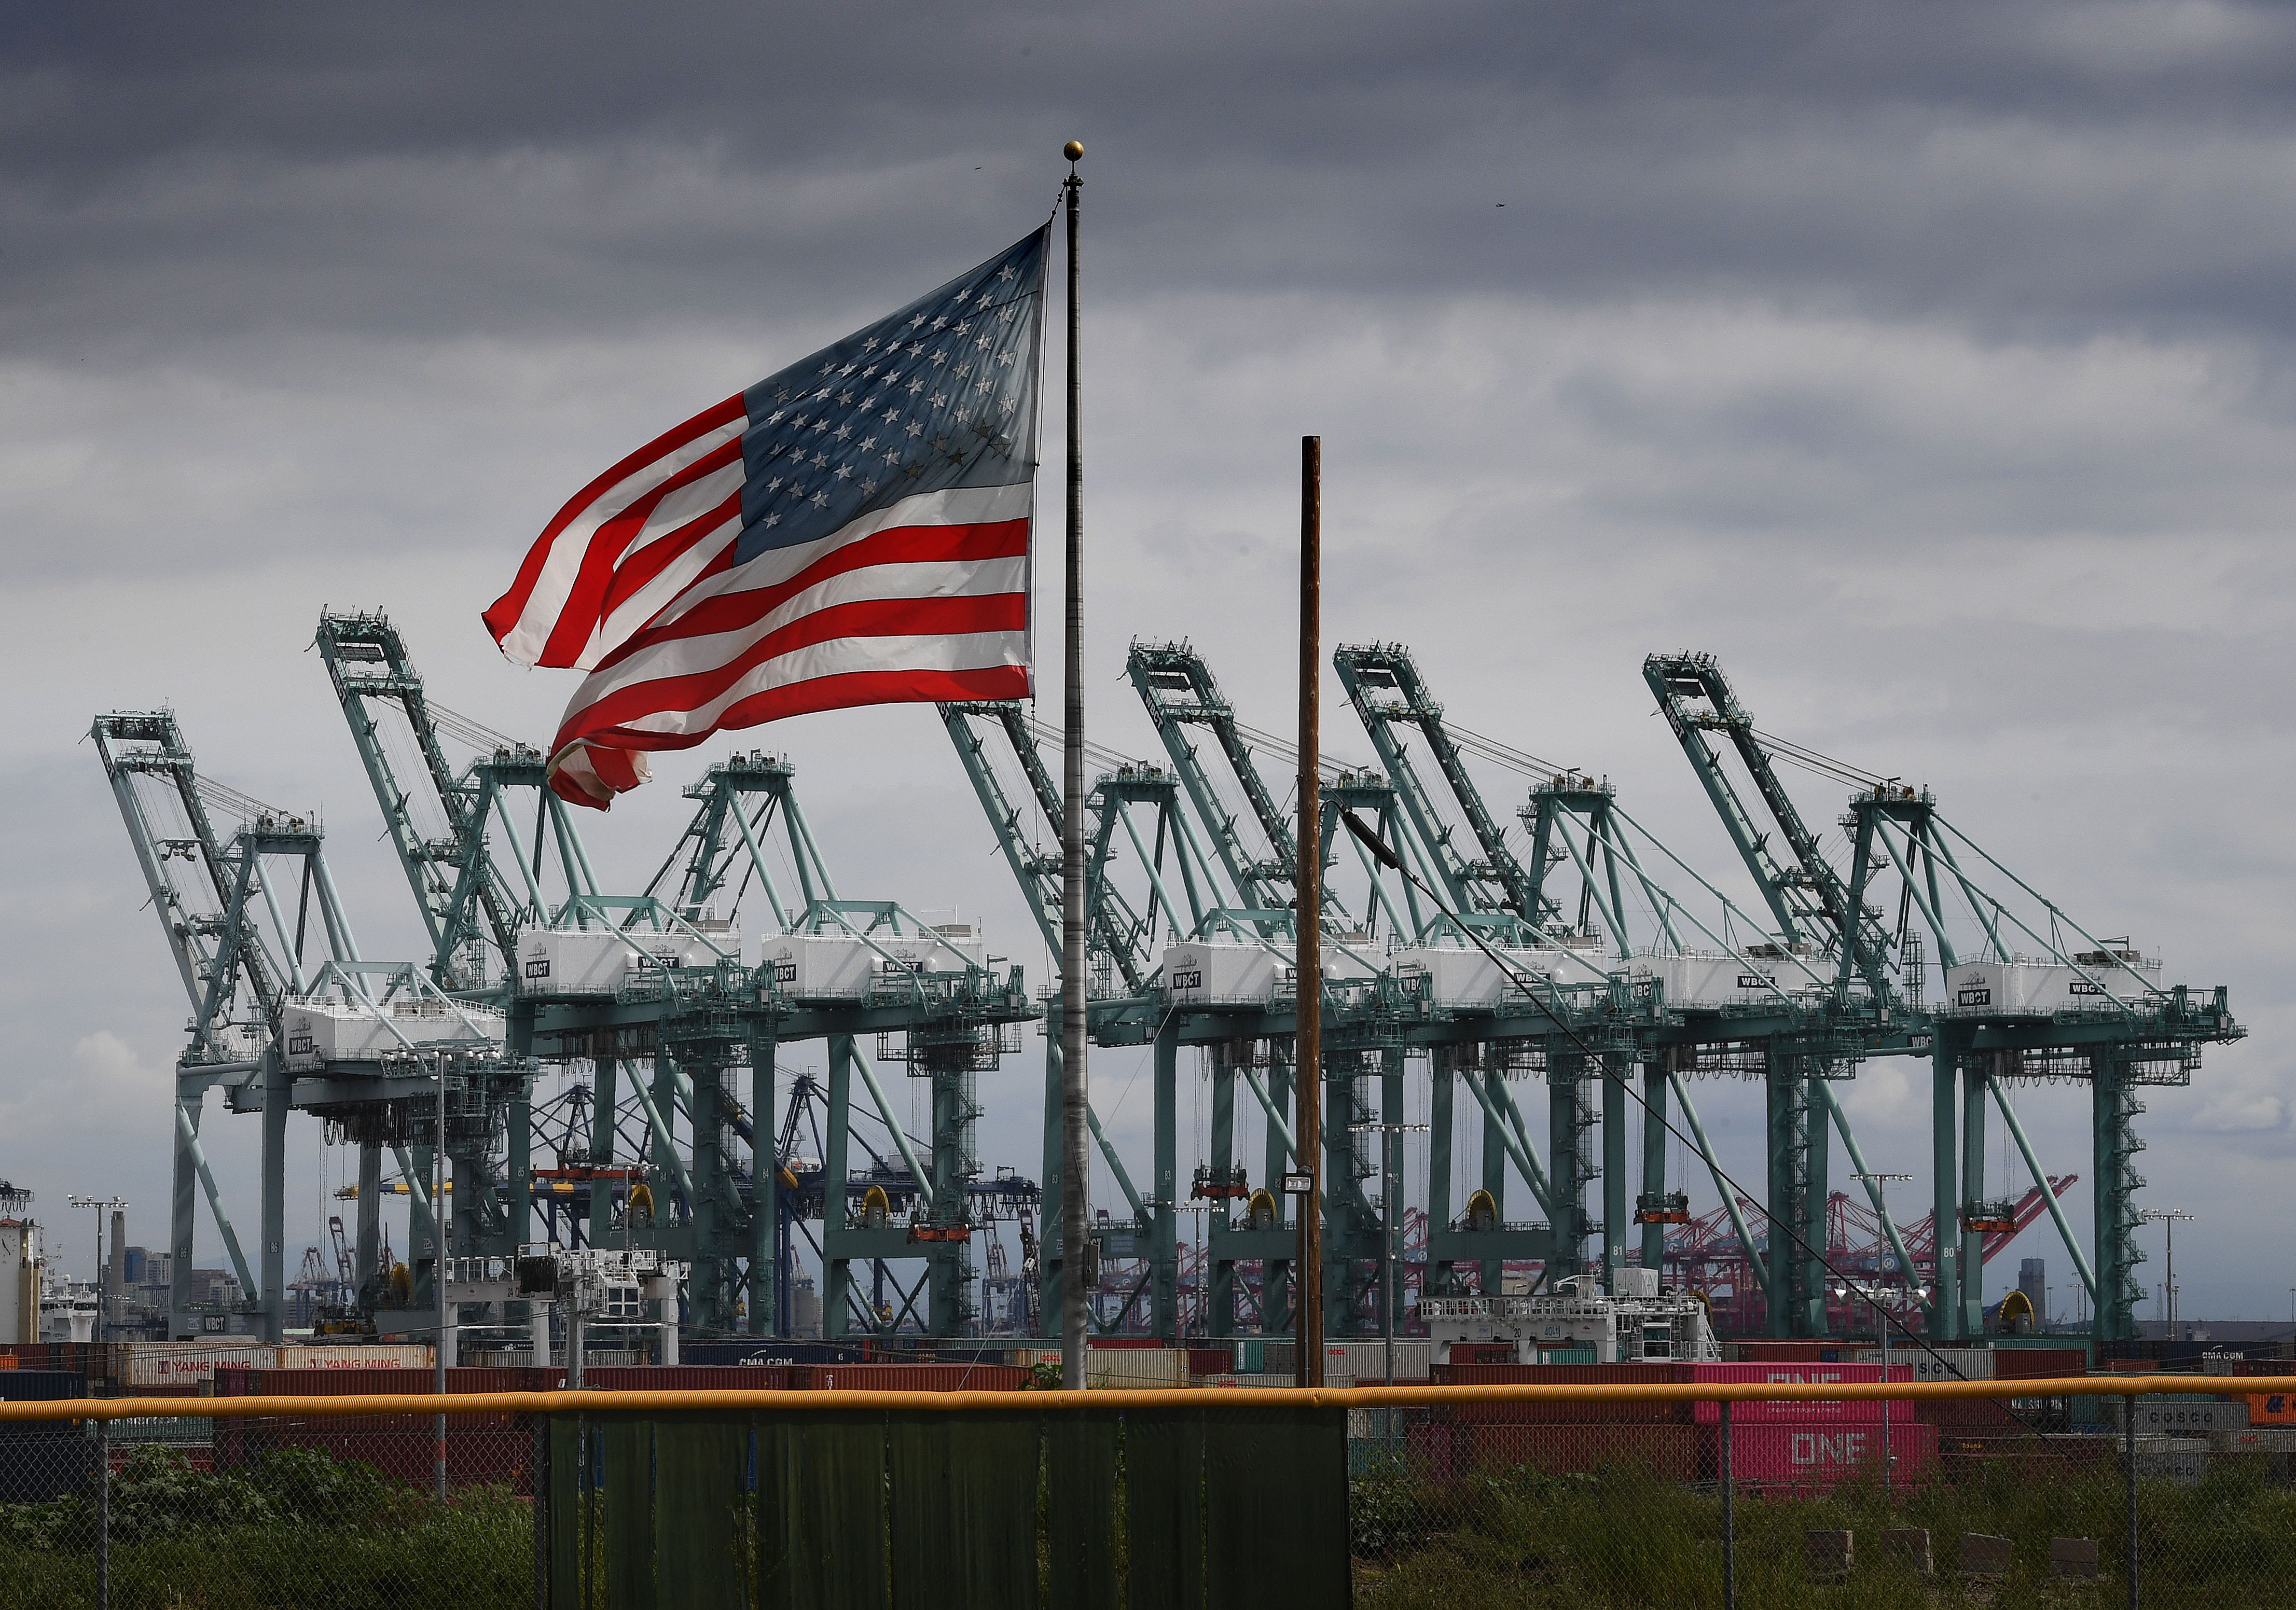 The US flag flies